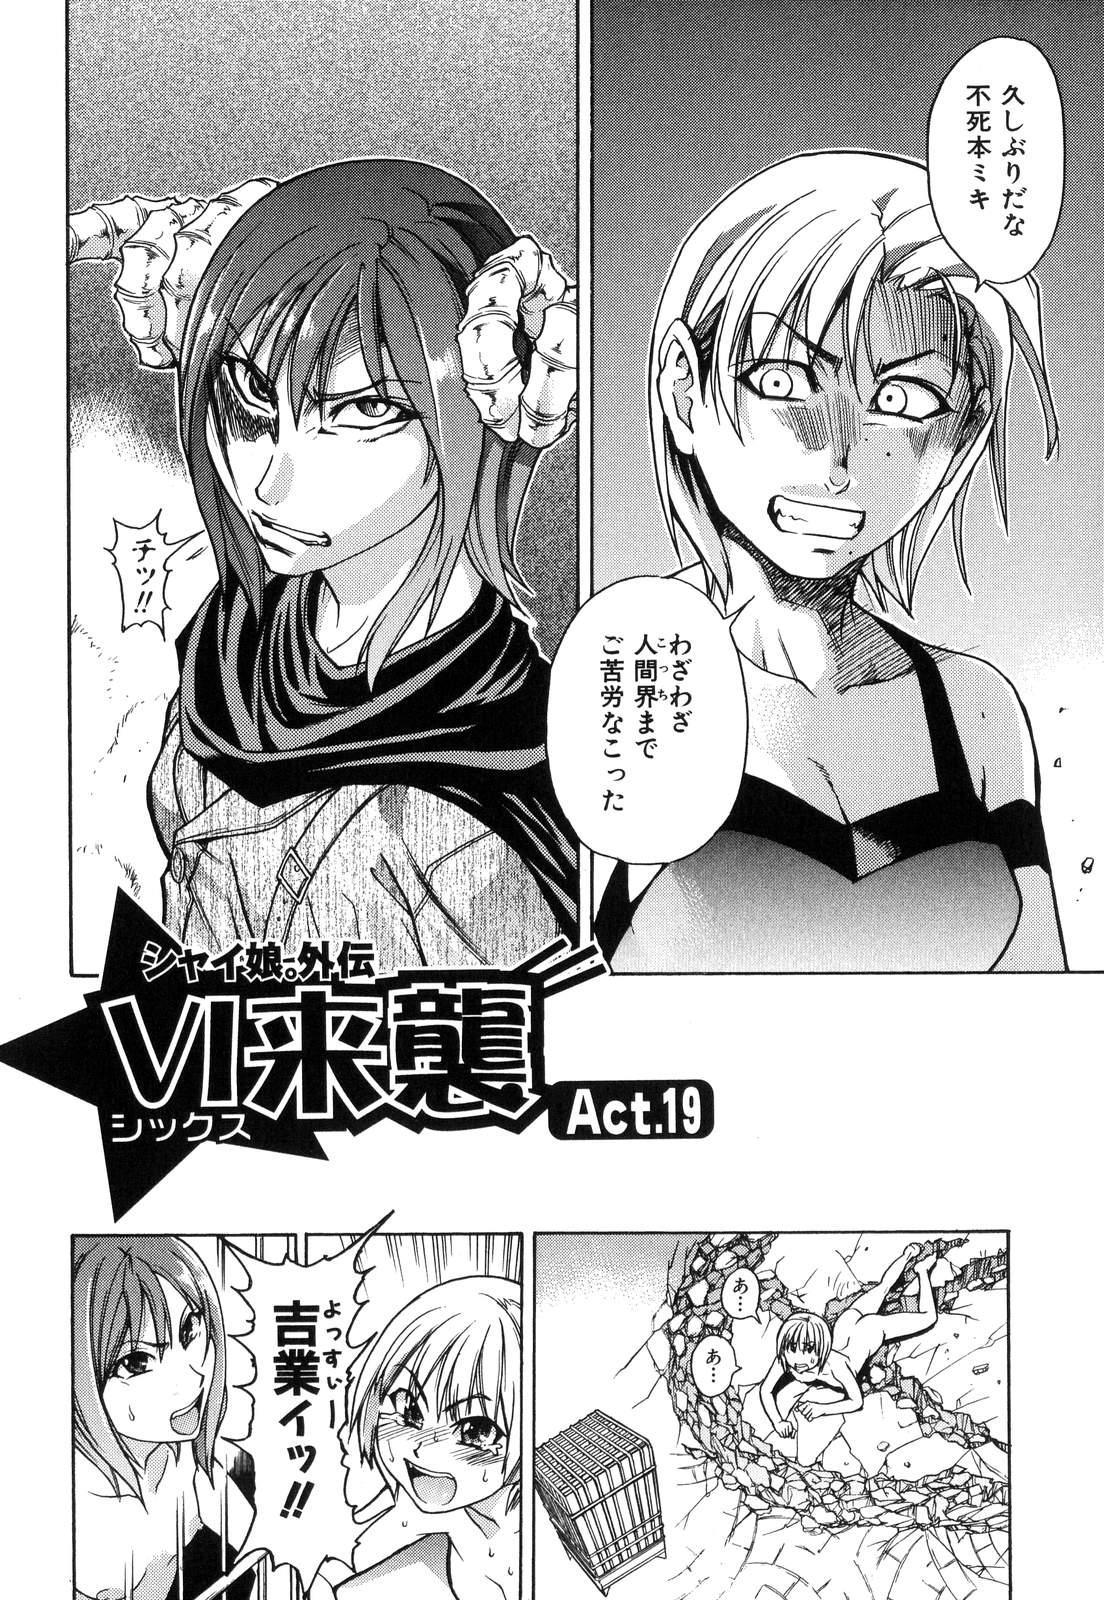 Shining Musume. 6. Rainbow Six 107